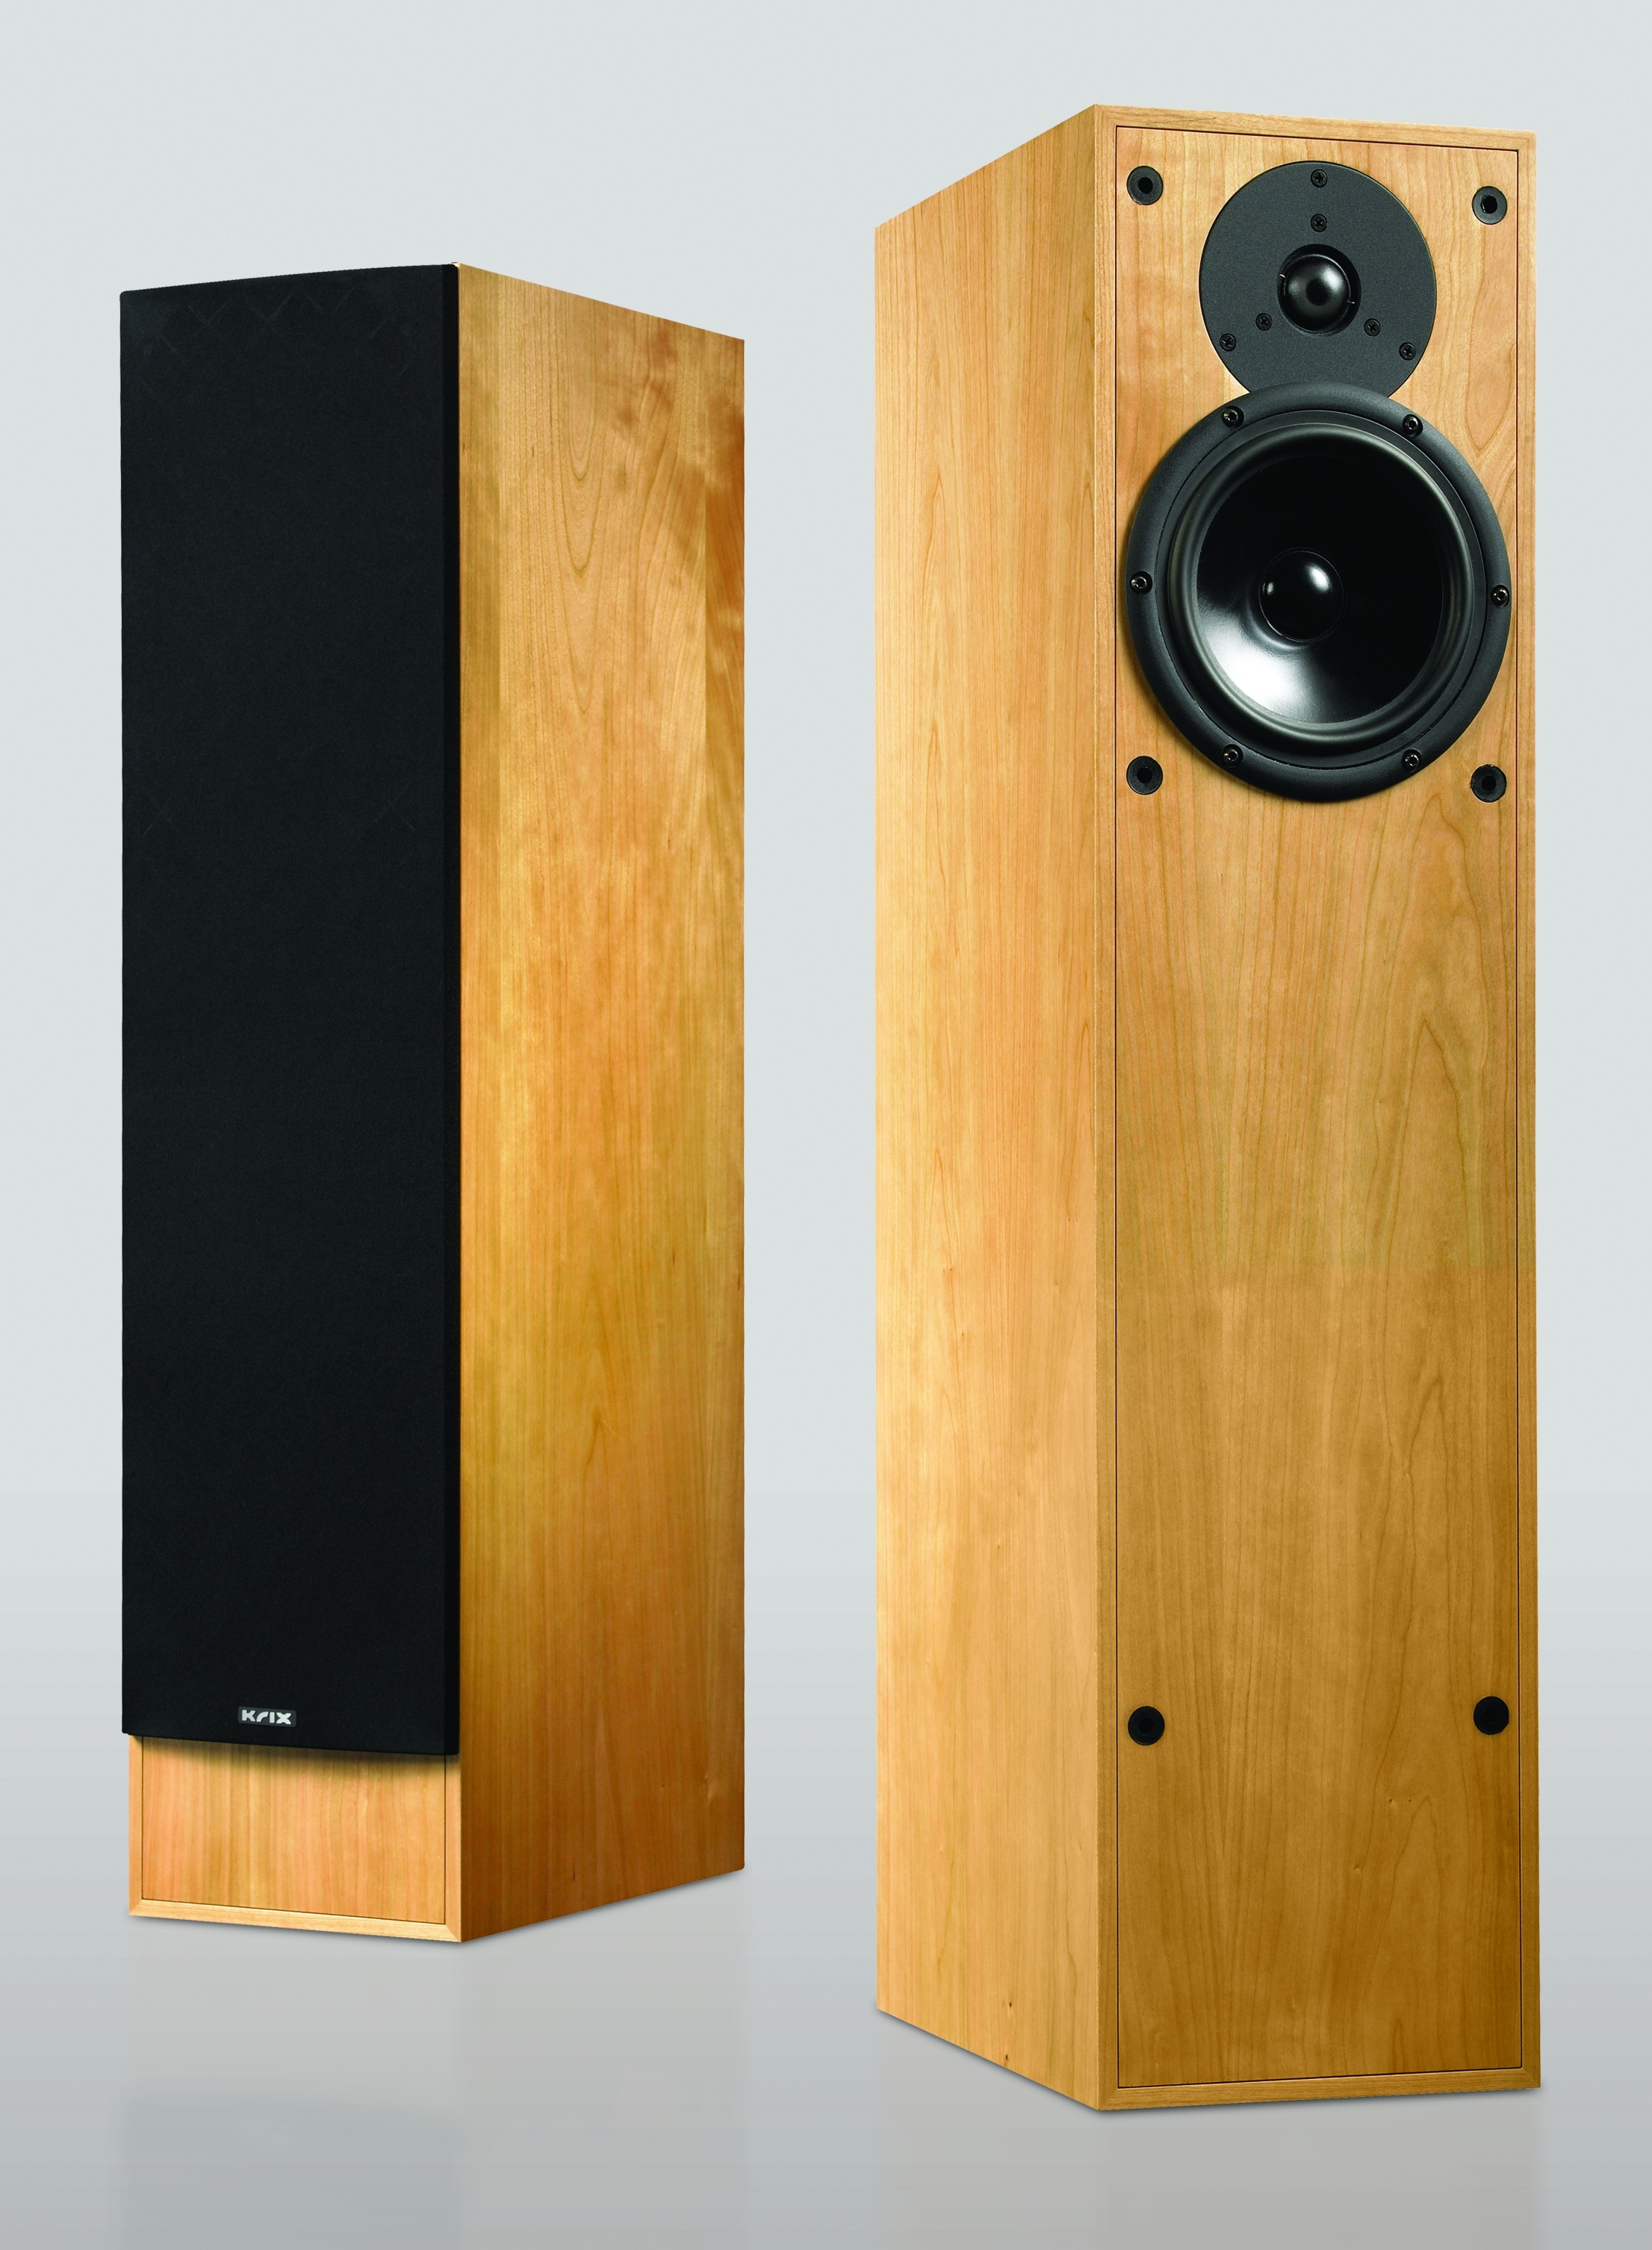 Krix Apex Floor Standing Speaker For Home Theatre Or Stereo